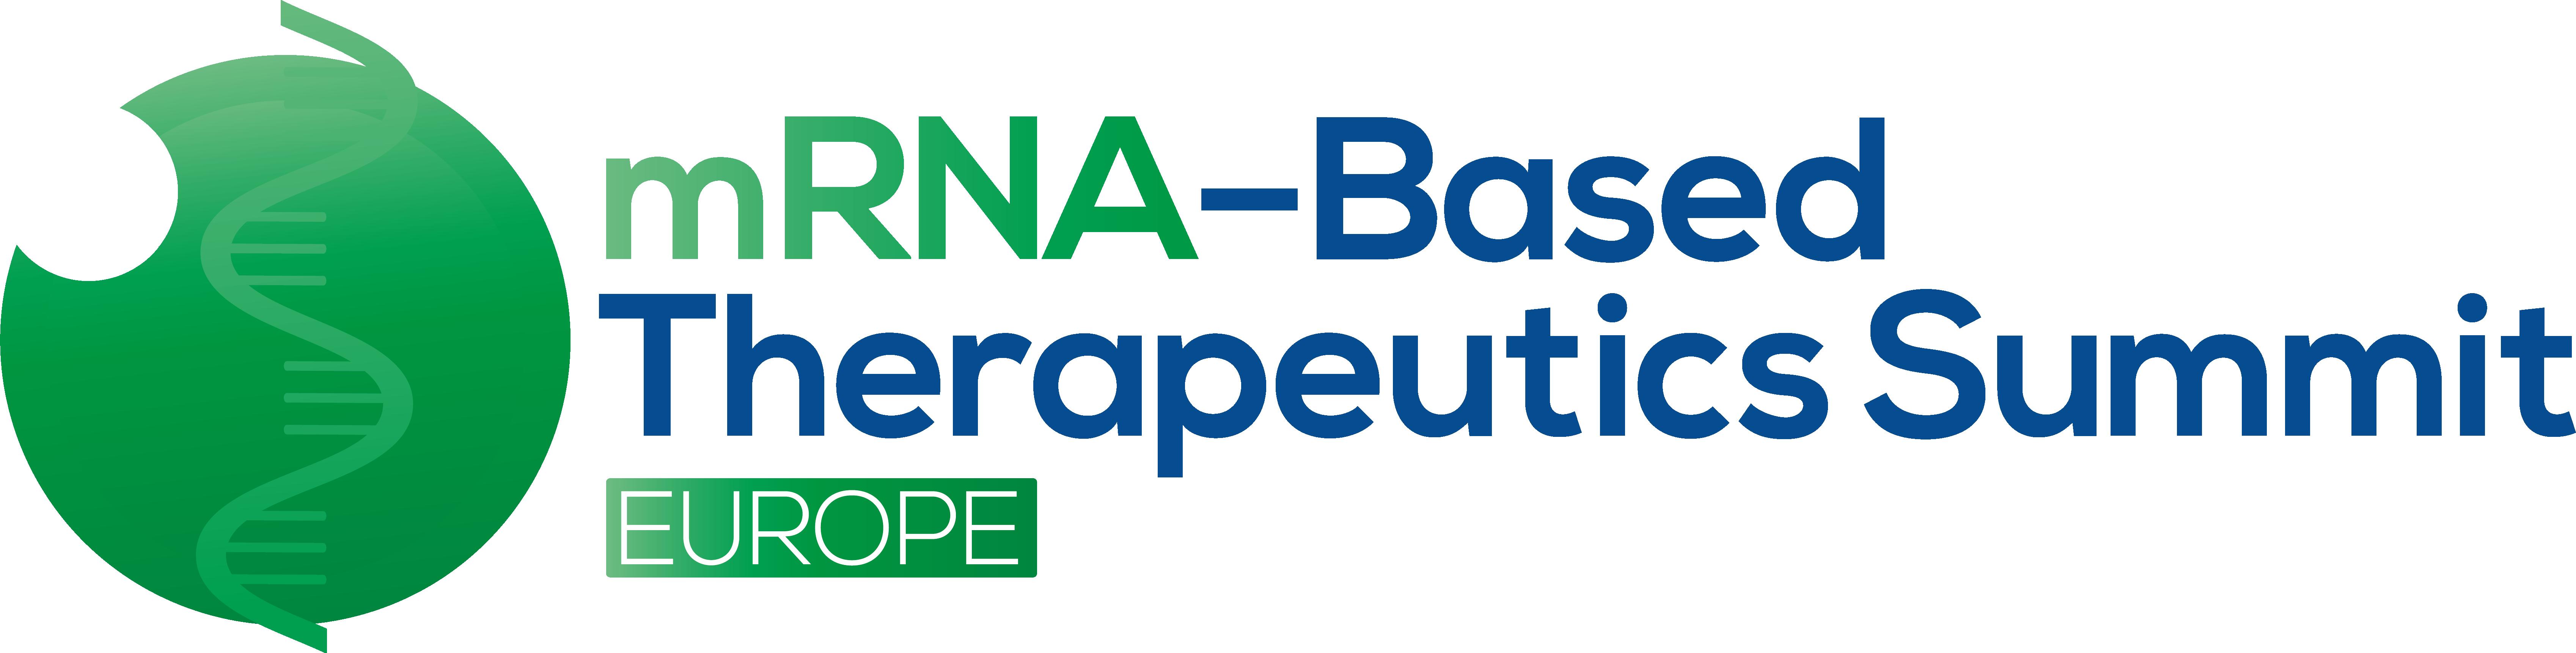 HW210823 mRNA Based Therapeutics Summit Europe logo FINAL